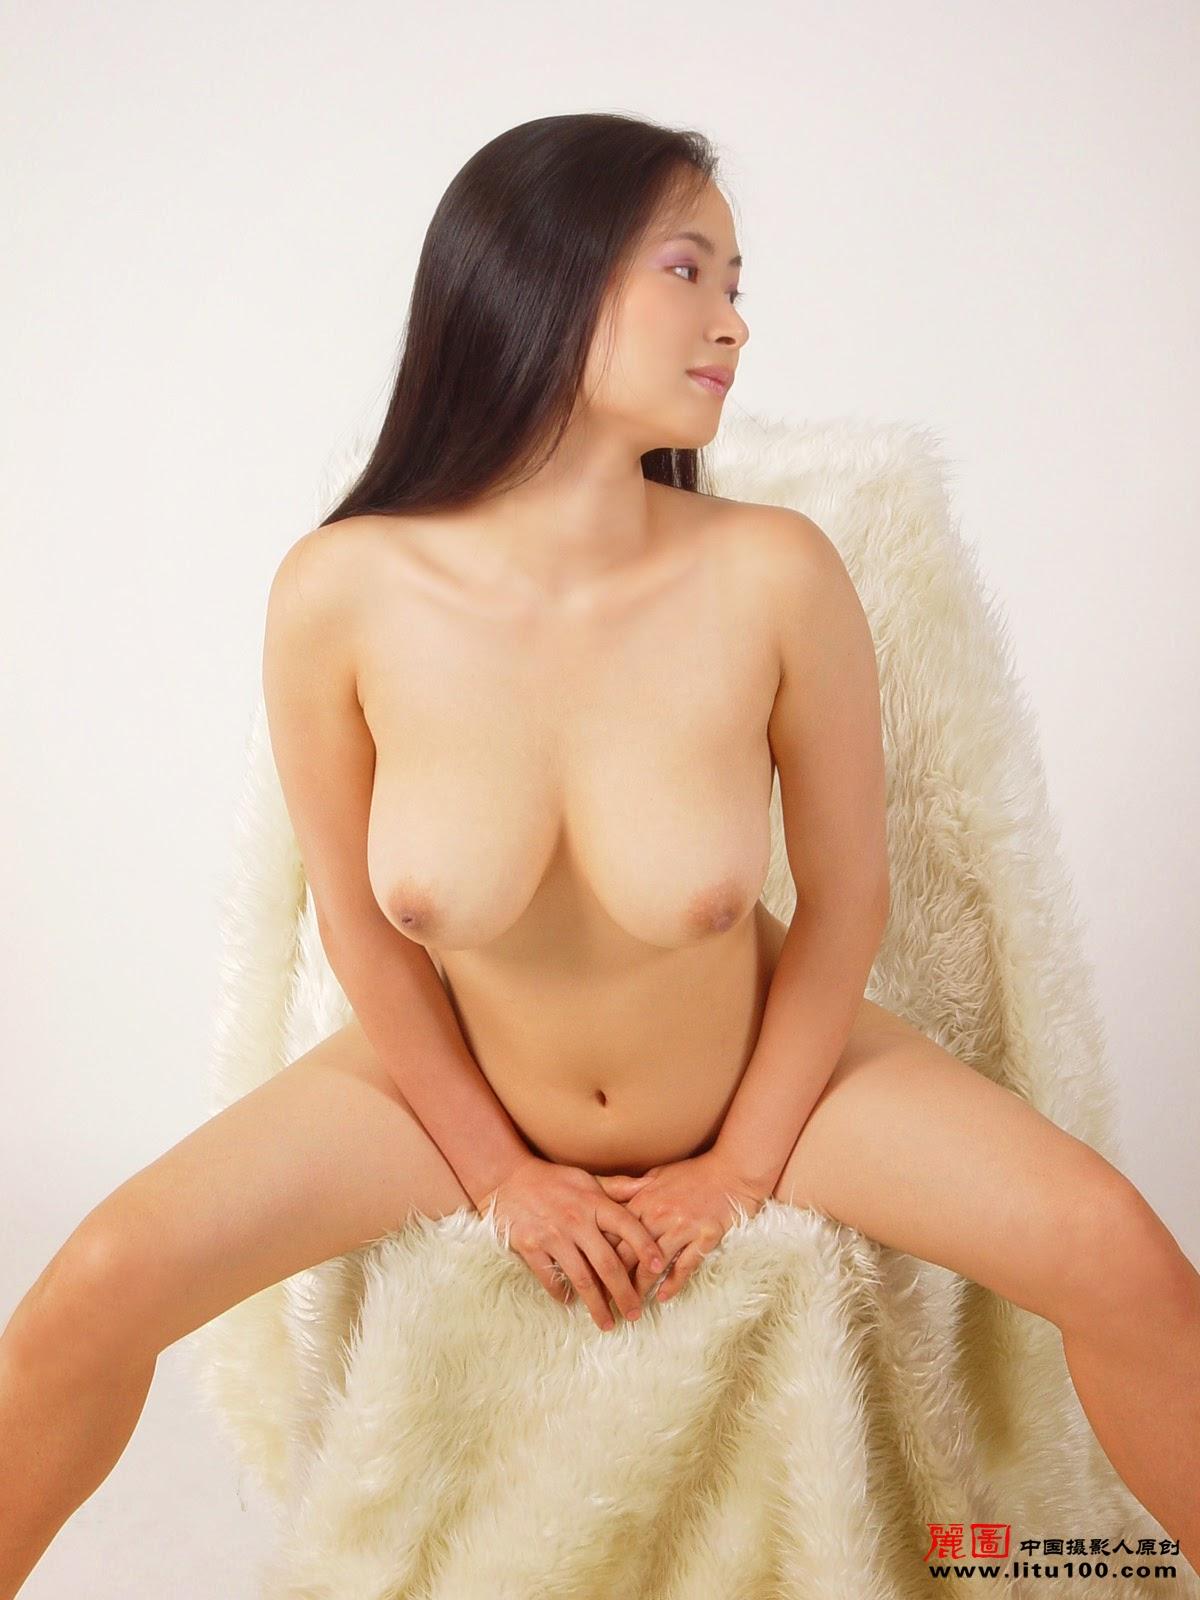 Erotic paintings of jia lu - 1 part 9